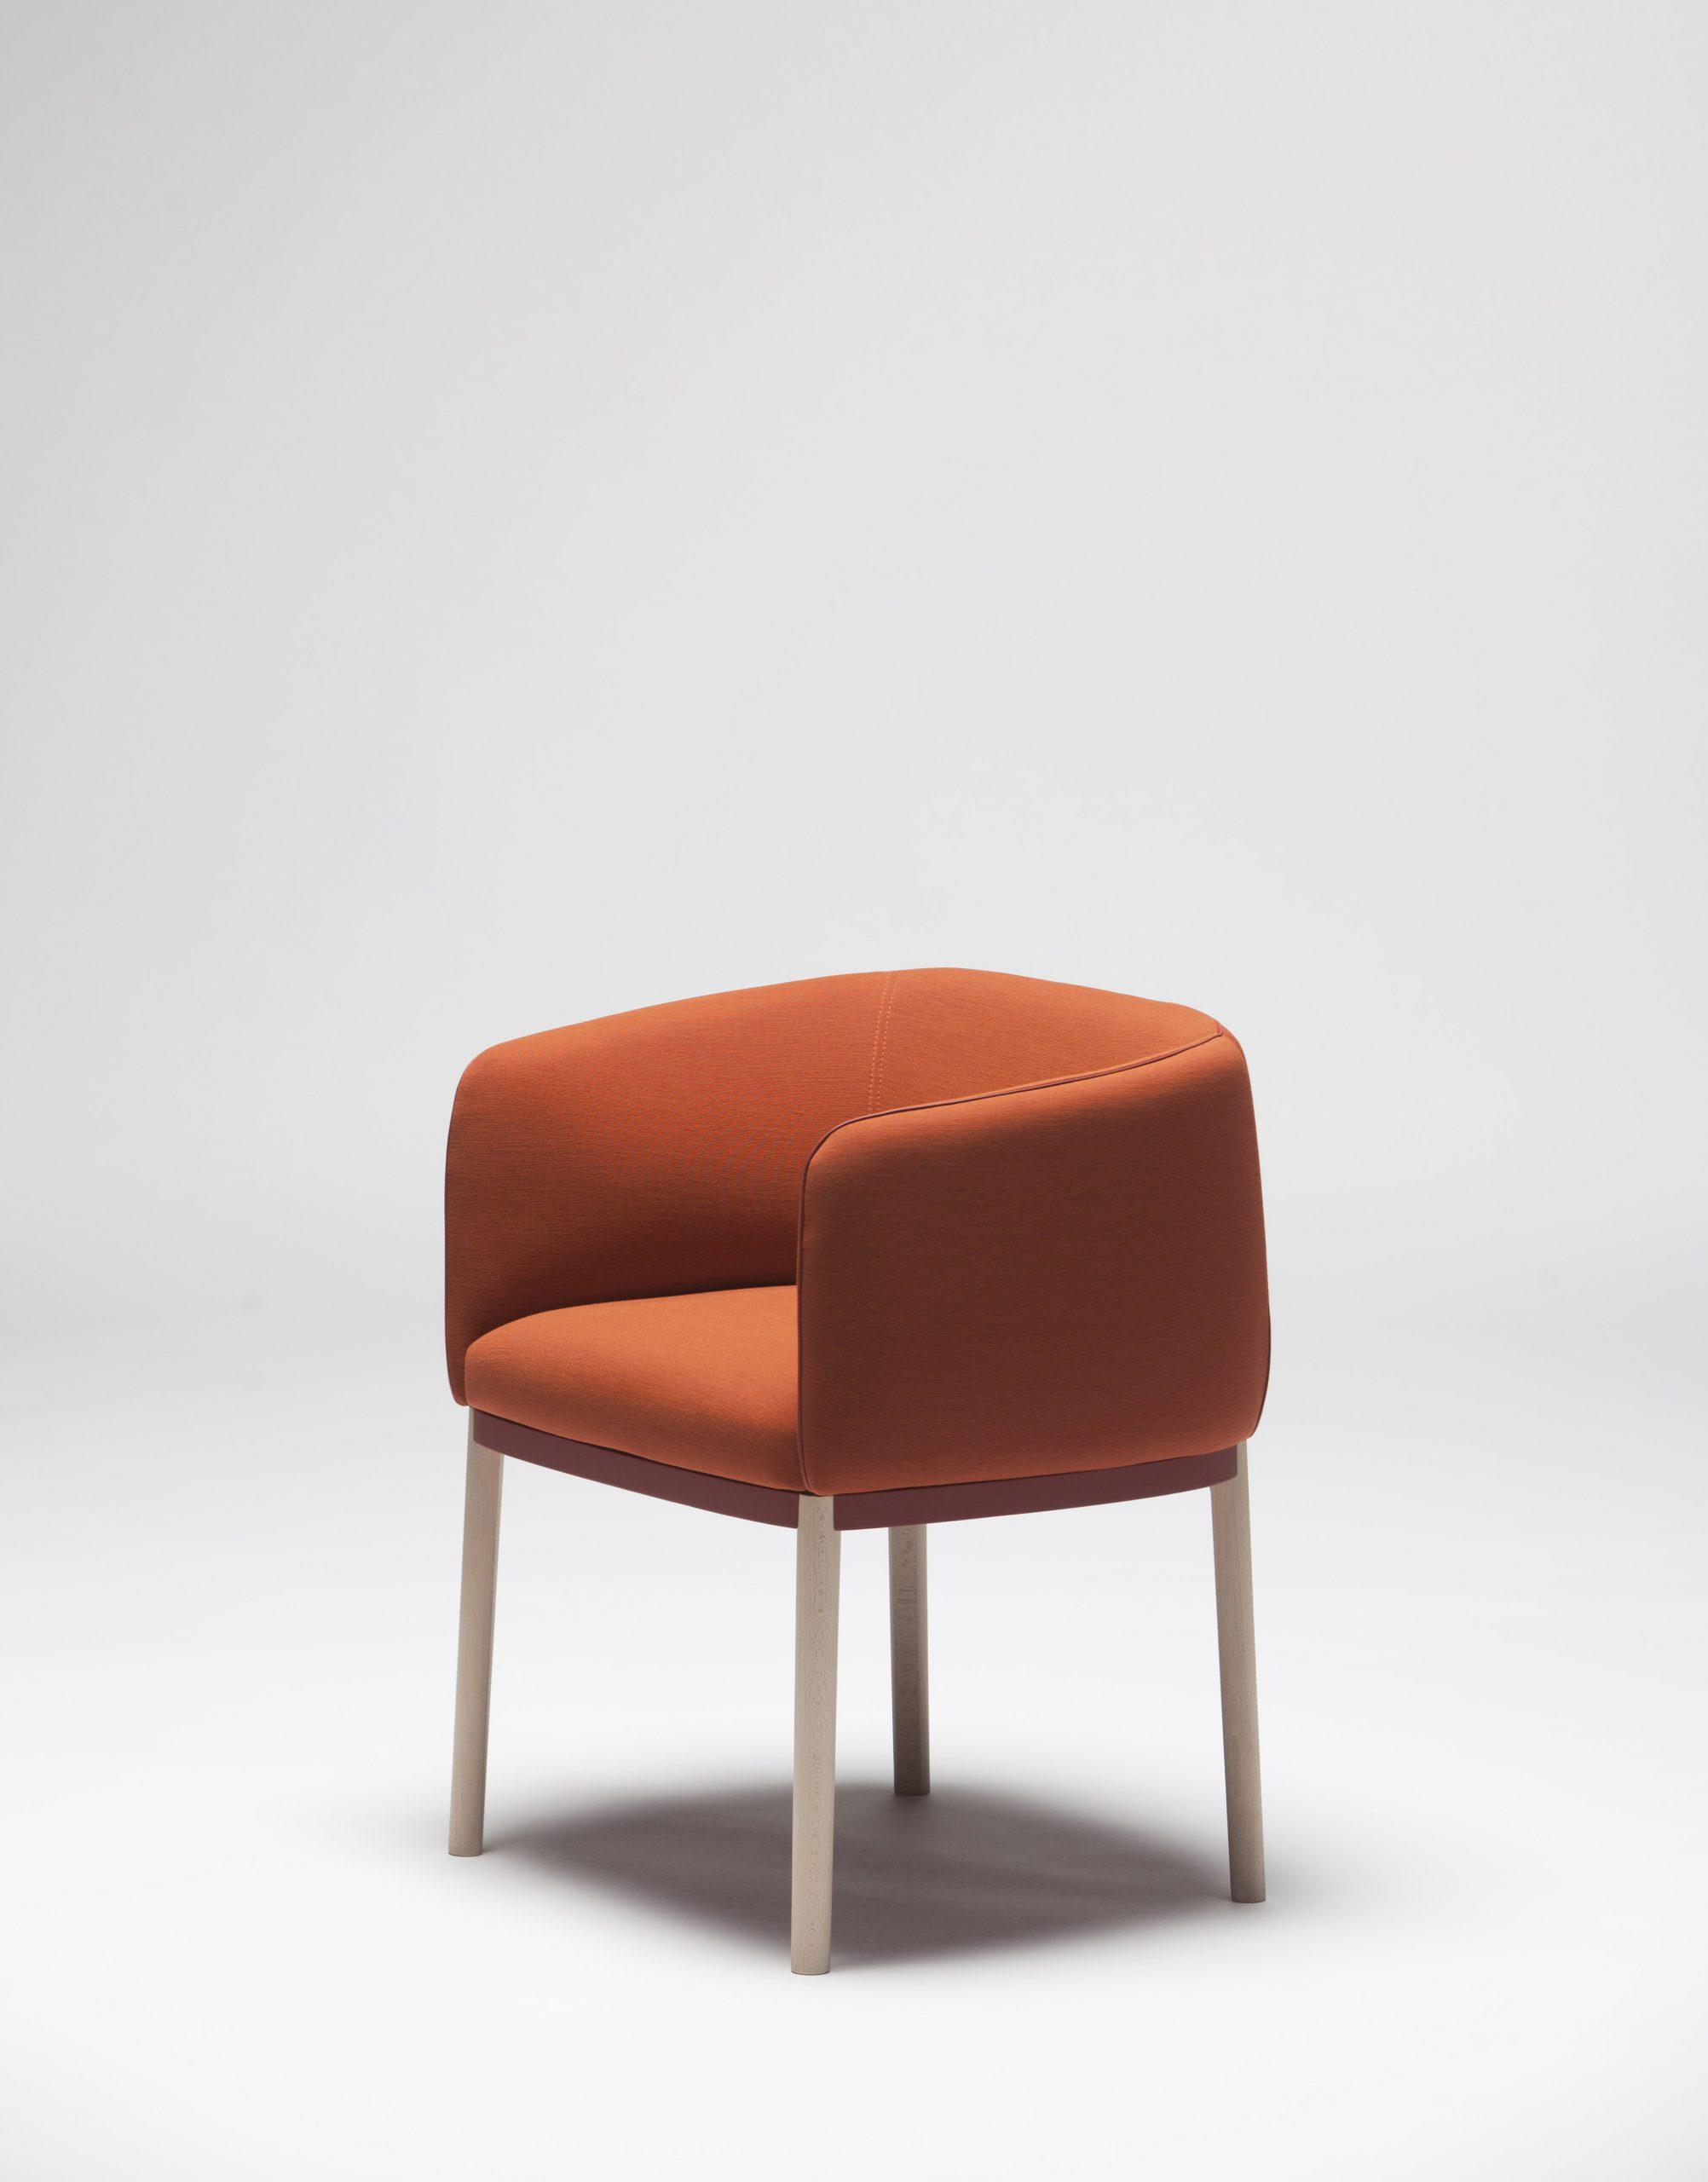 Cape armchair by Debiasi Sandri for Tekhne